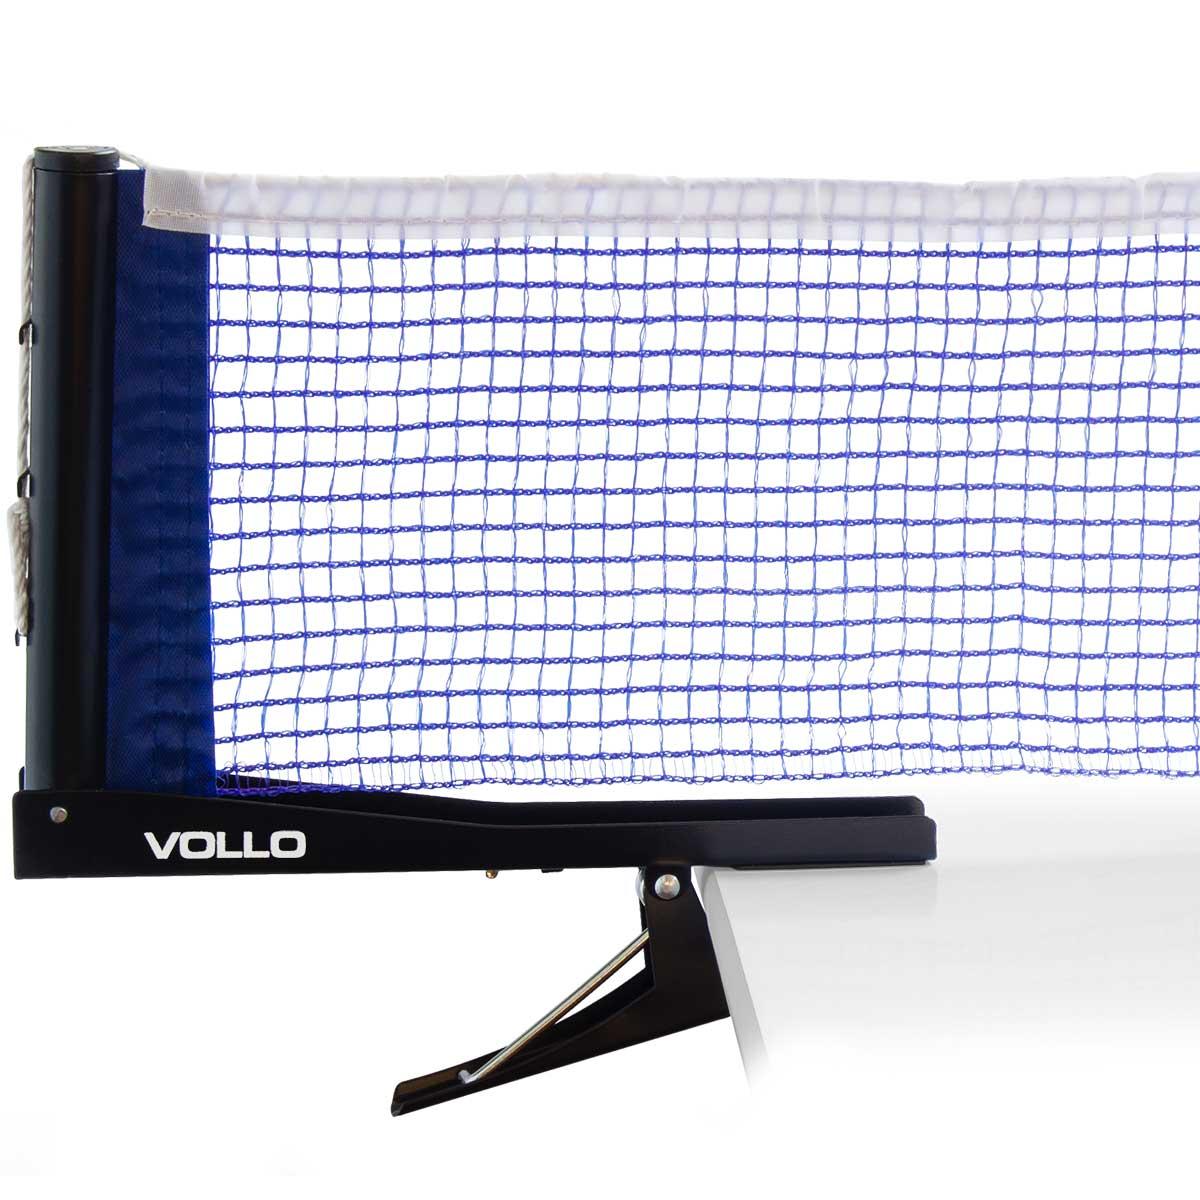 Rede Tenis de Mesa Ping Pong com Suporte Alicate - Vollo